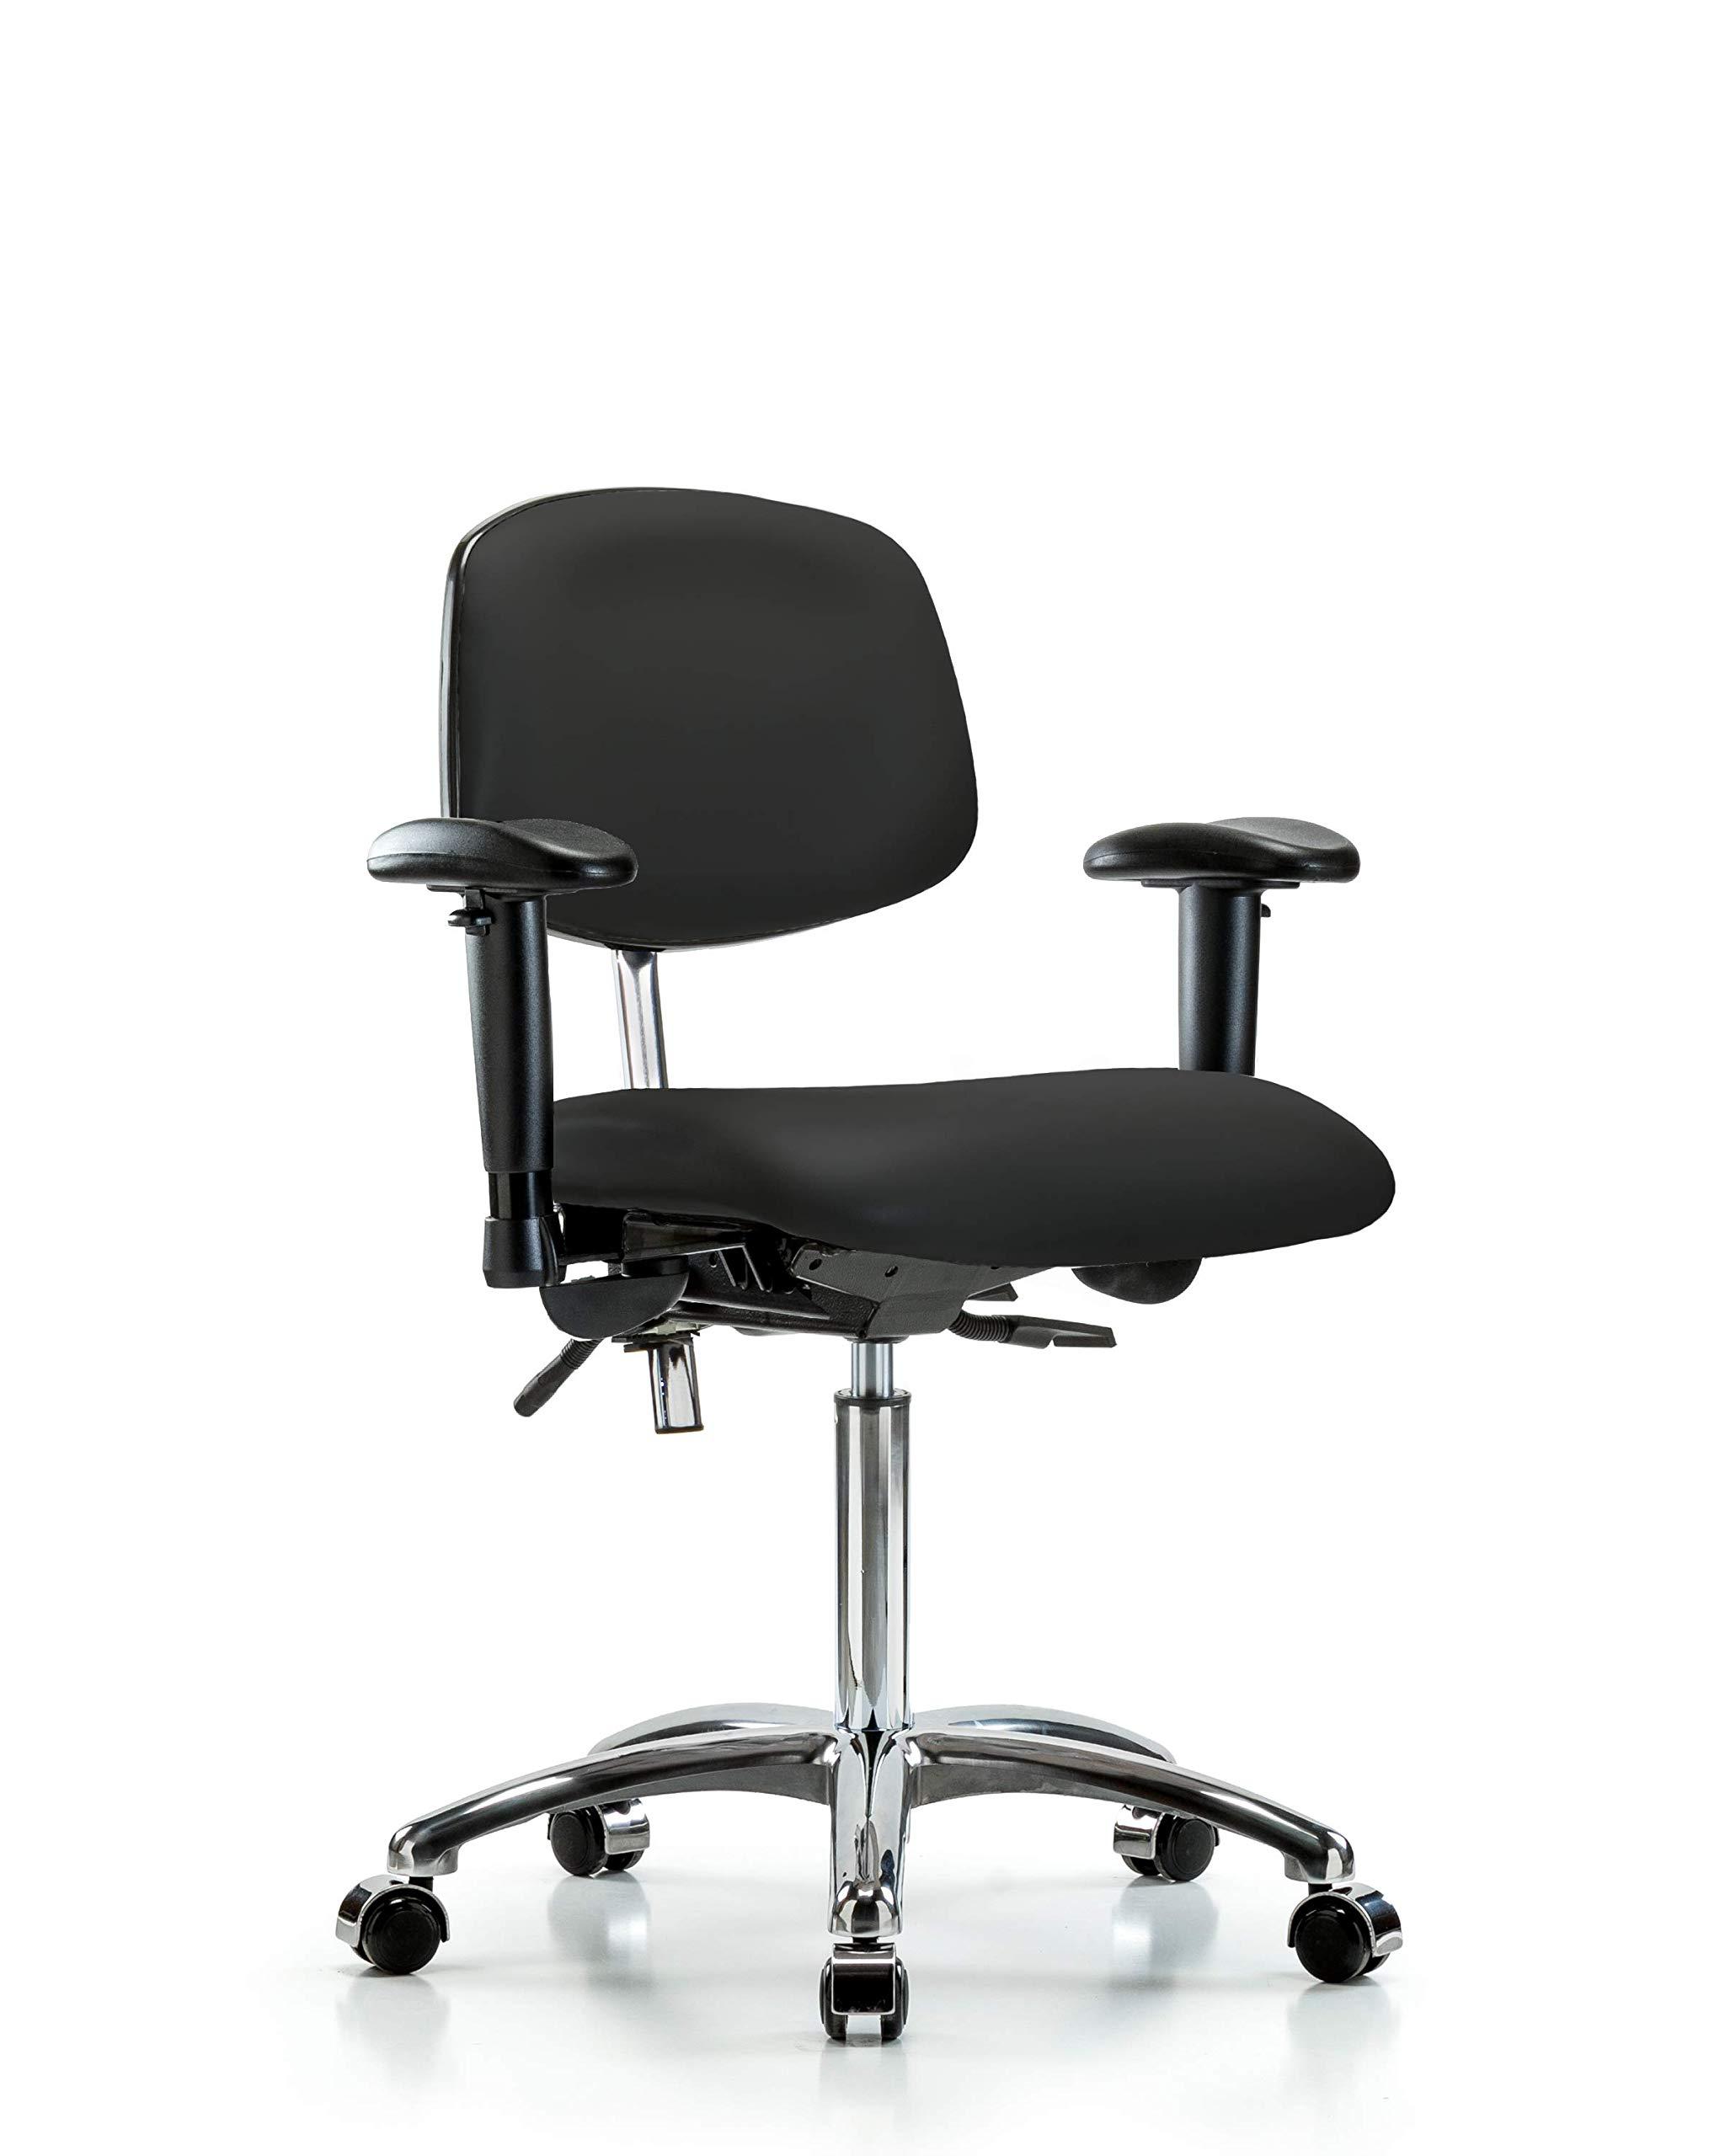 LabTech Seating LT43336 Class 100 Clean Room Vinyl Medium Bench Chair Chrome Base, Tilt, Arms, Chrome Casters, Black